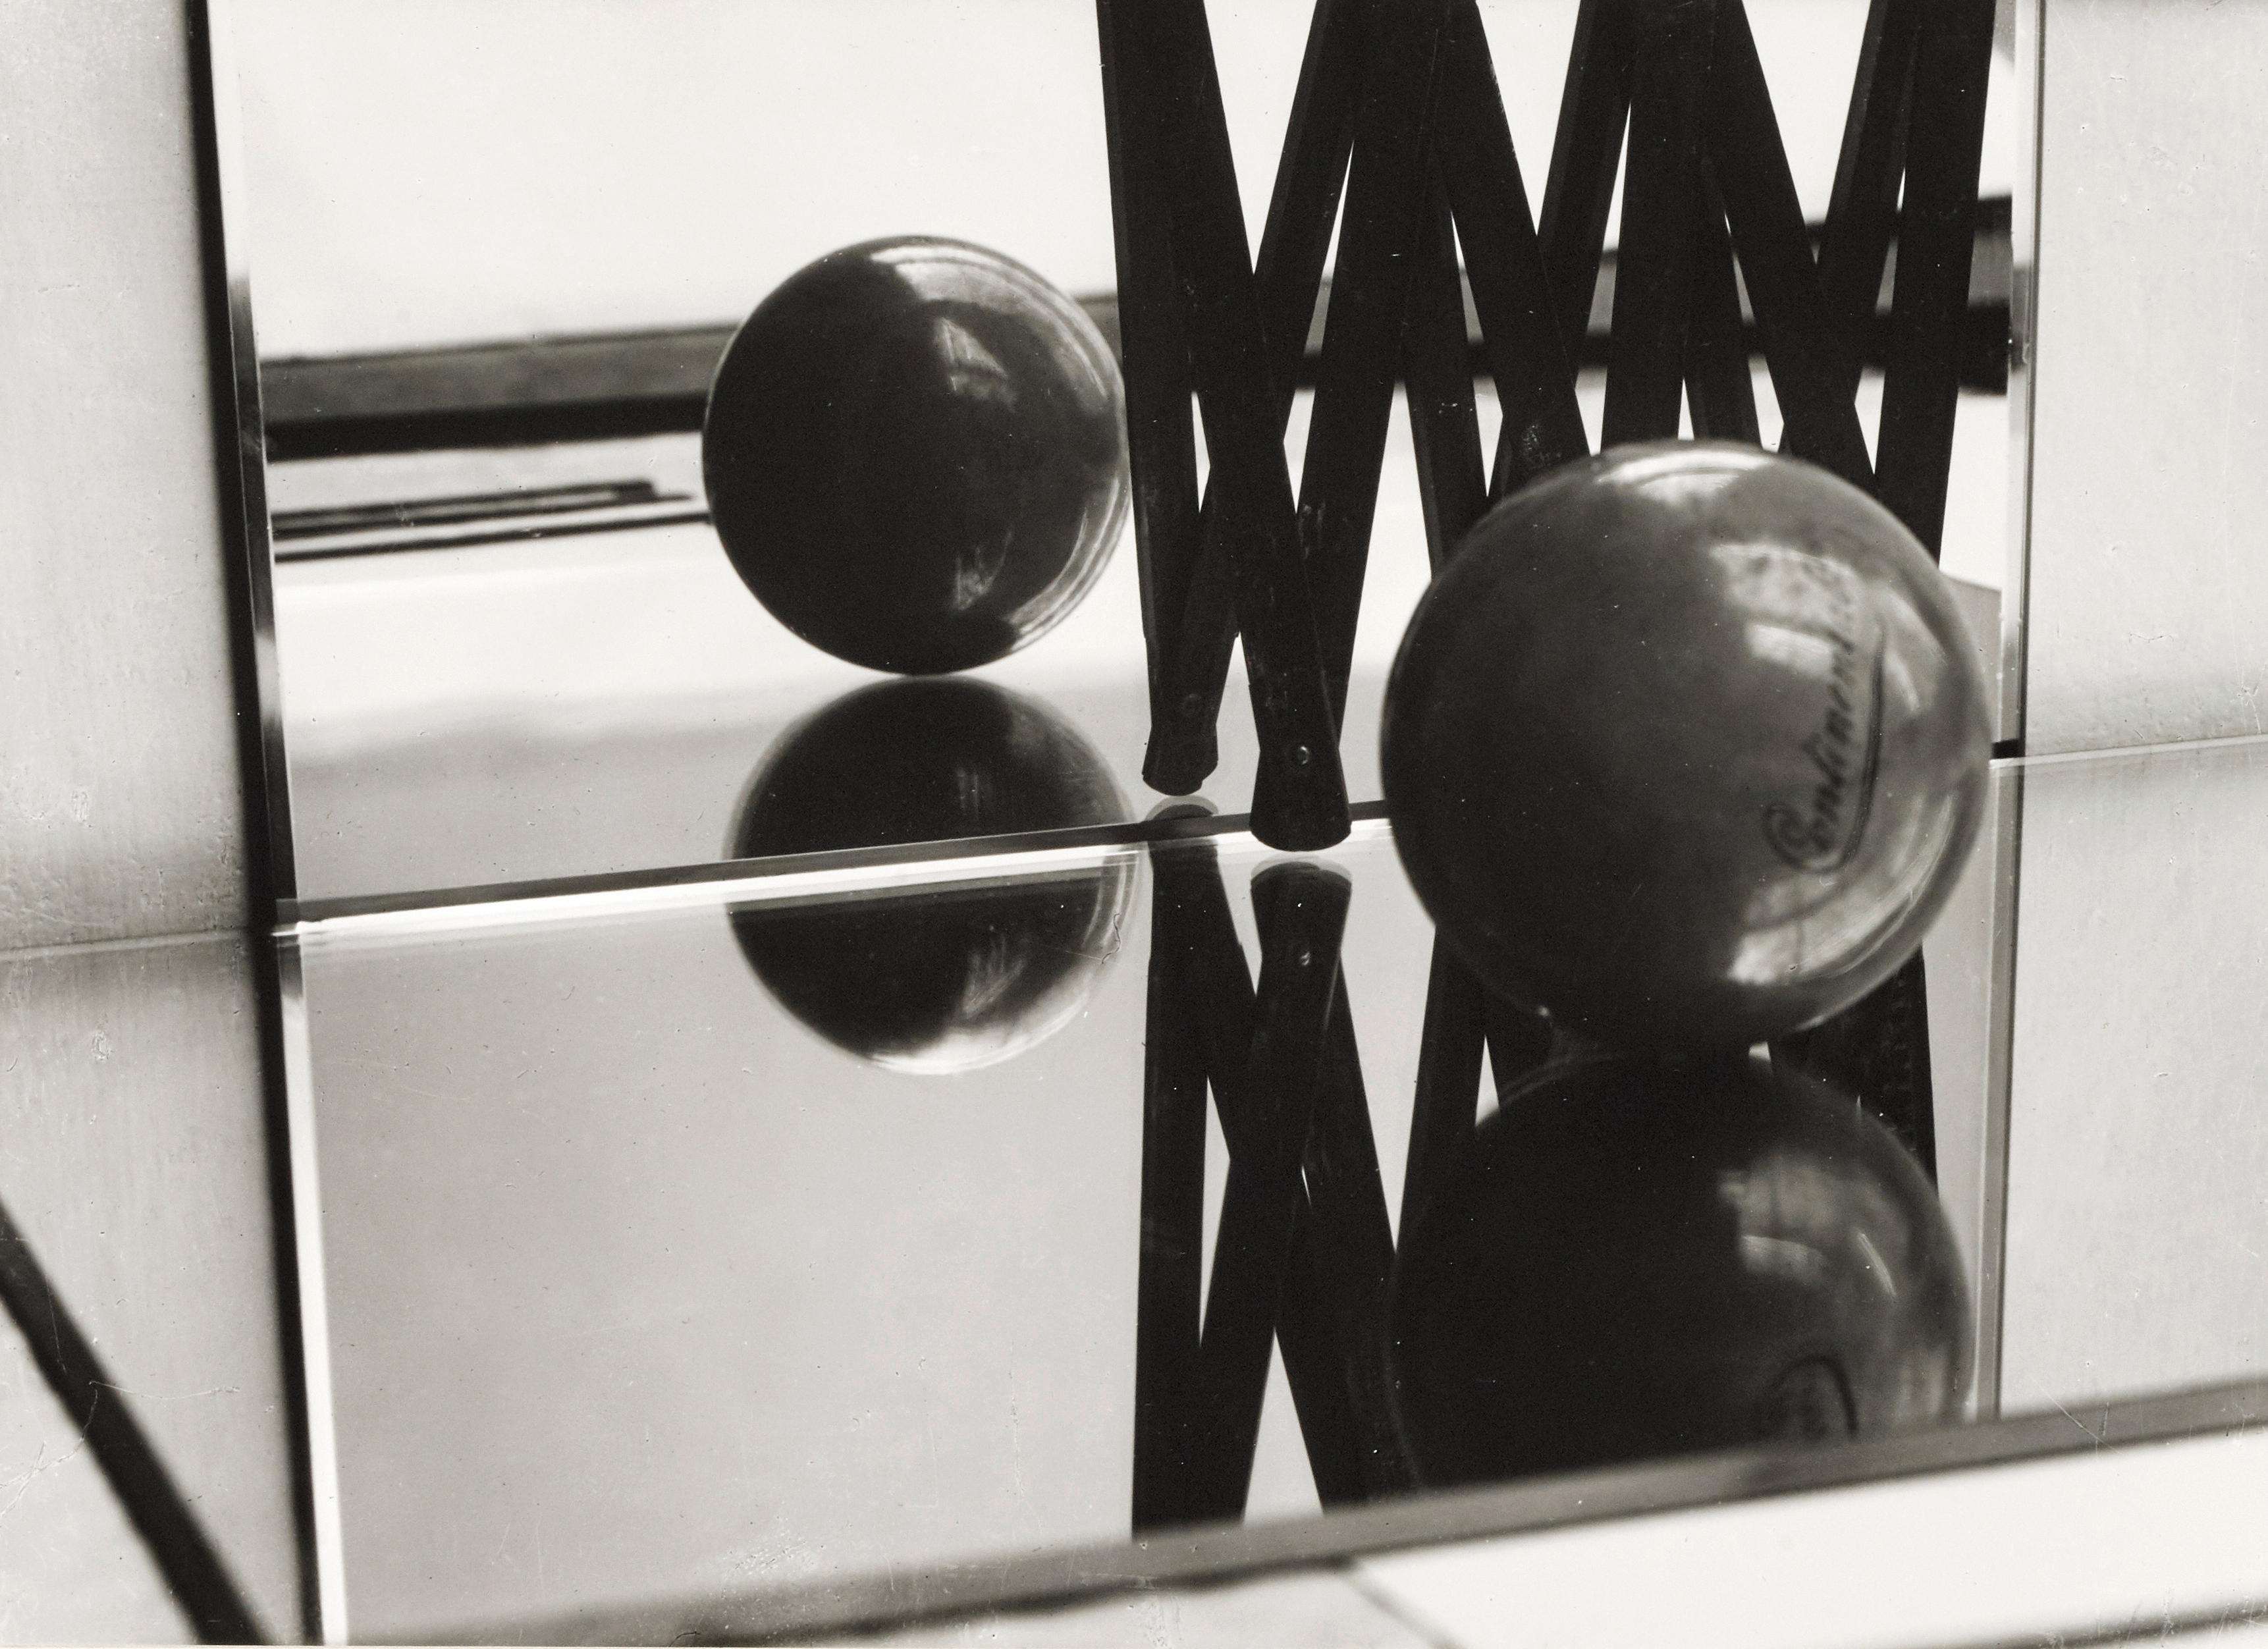 Florence Henri, Untitled Abstraction, 2 works one framed, one unframed